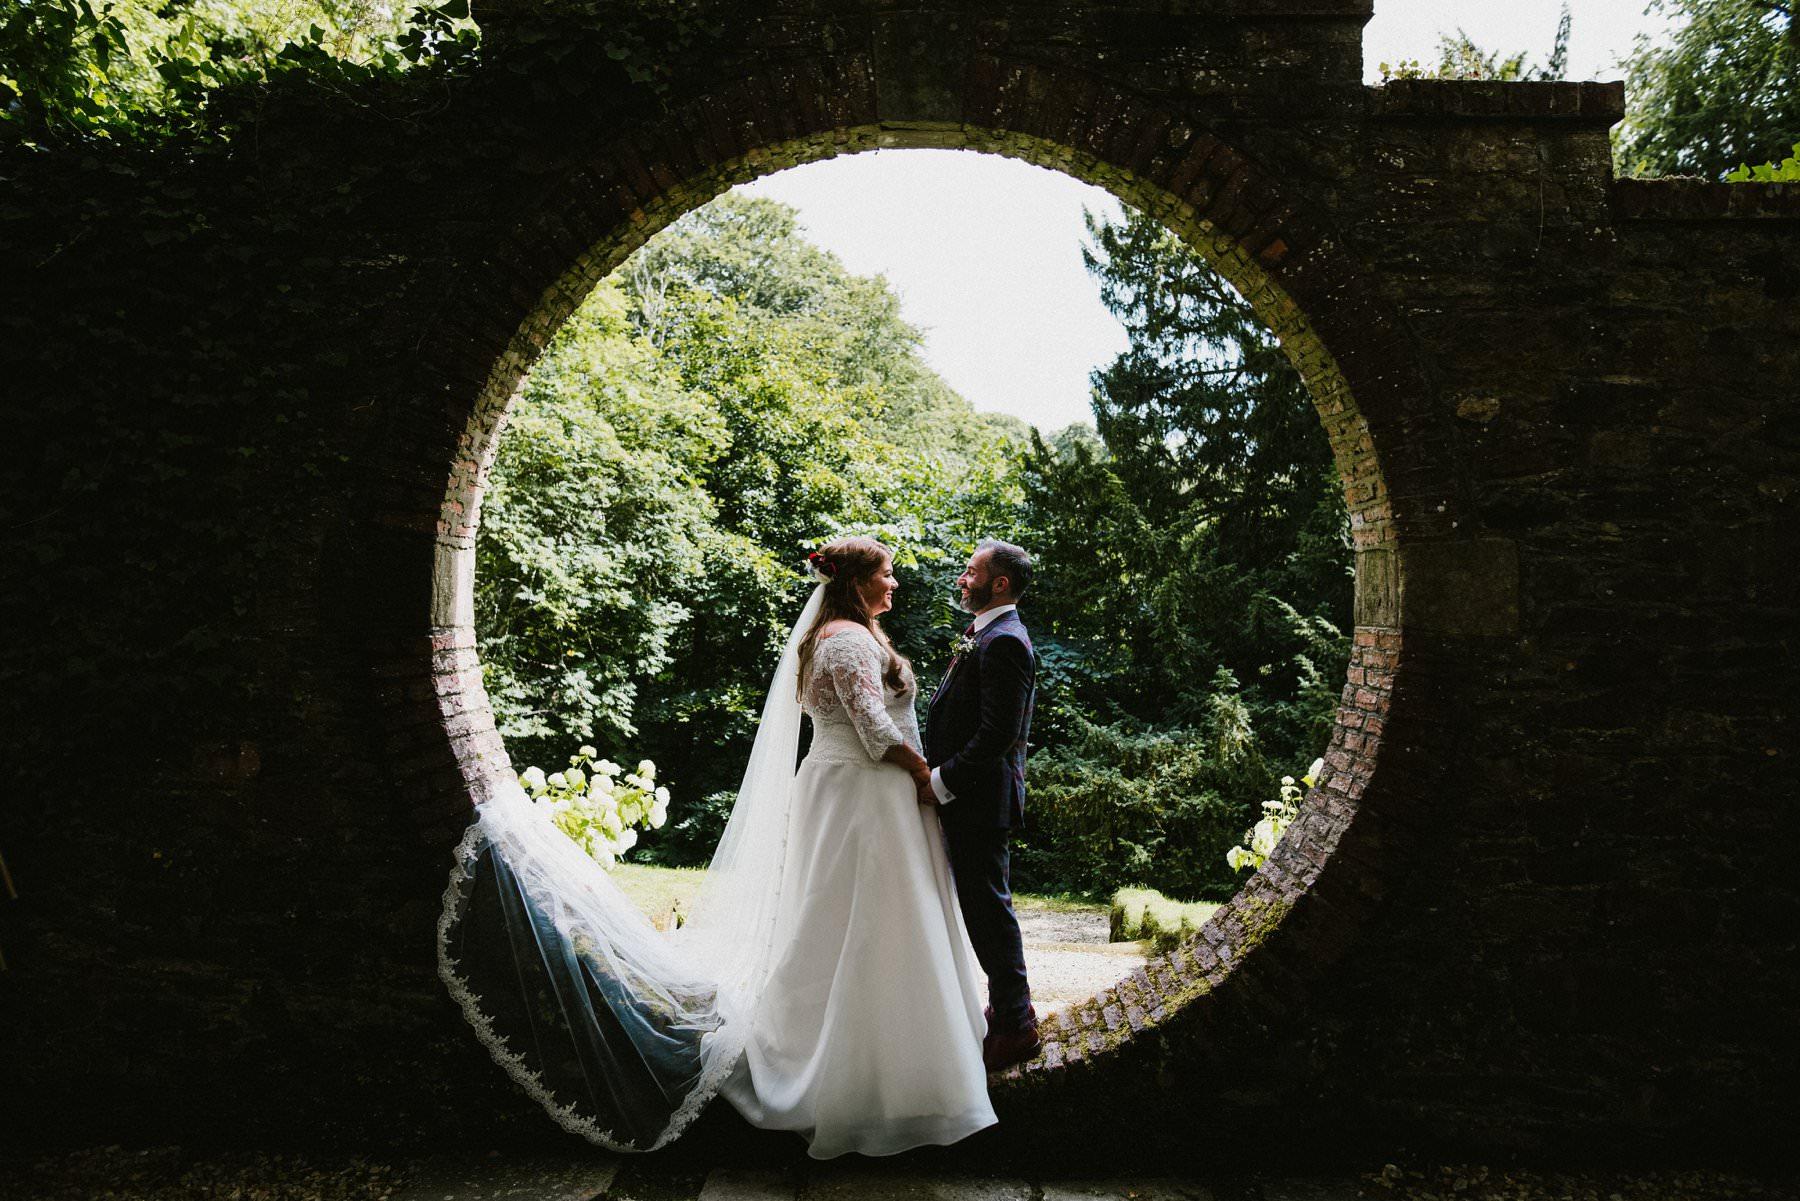 drenagh wedding photography